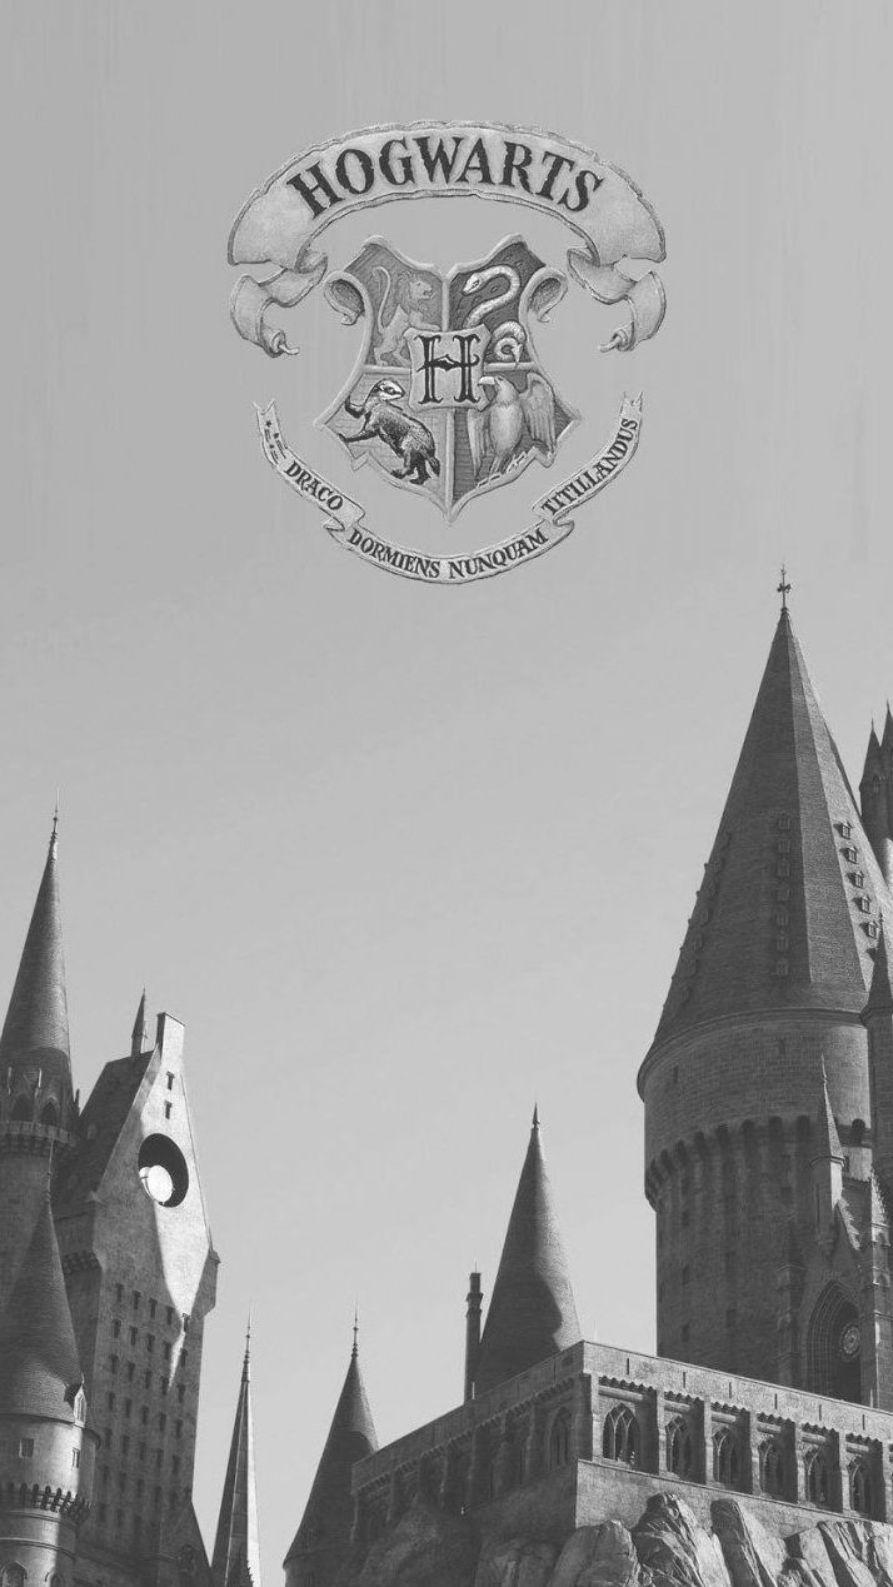 Hogwarts Harry Potter Iphone Wallpaper Harry Potter Iphone Harry Potter Background Harry Potter Wallpaper Phone